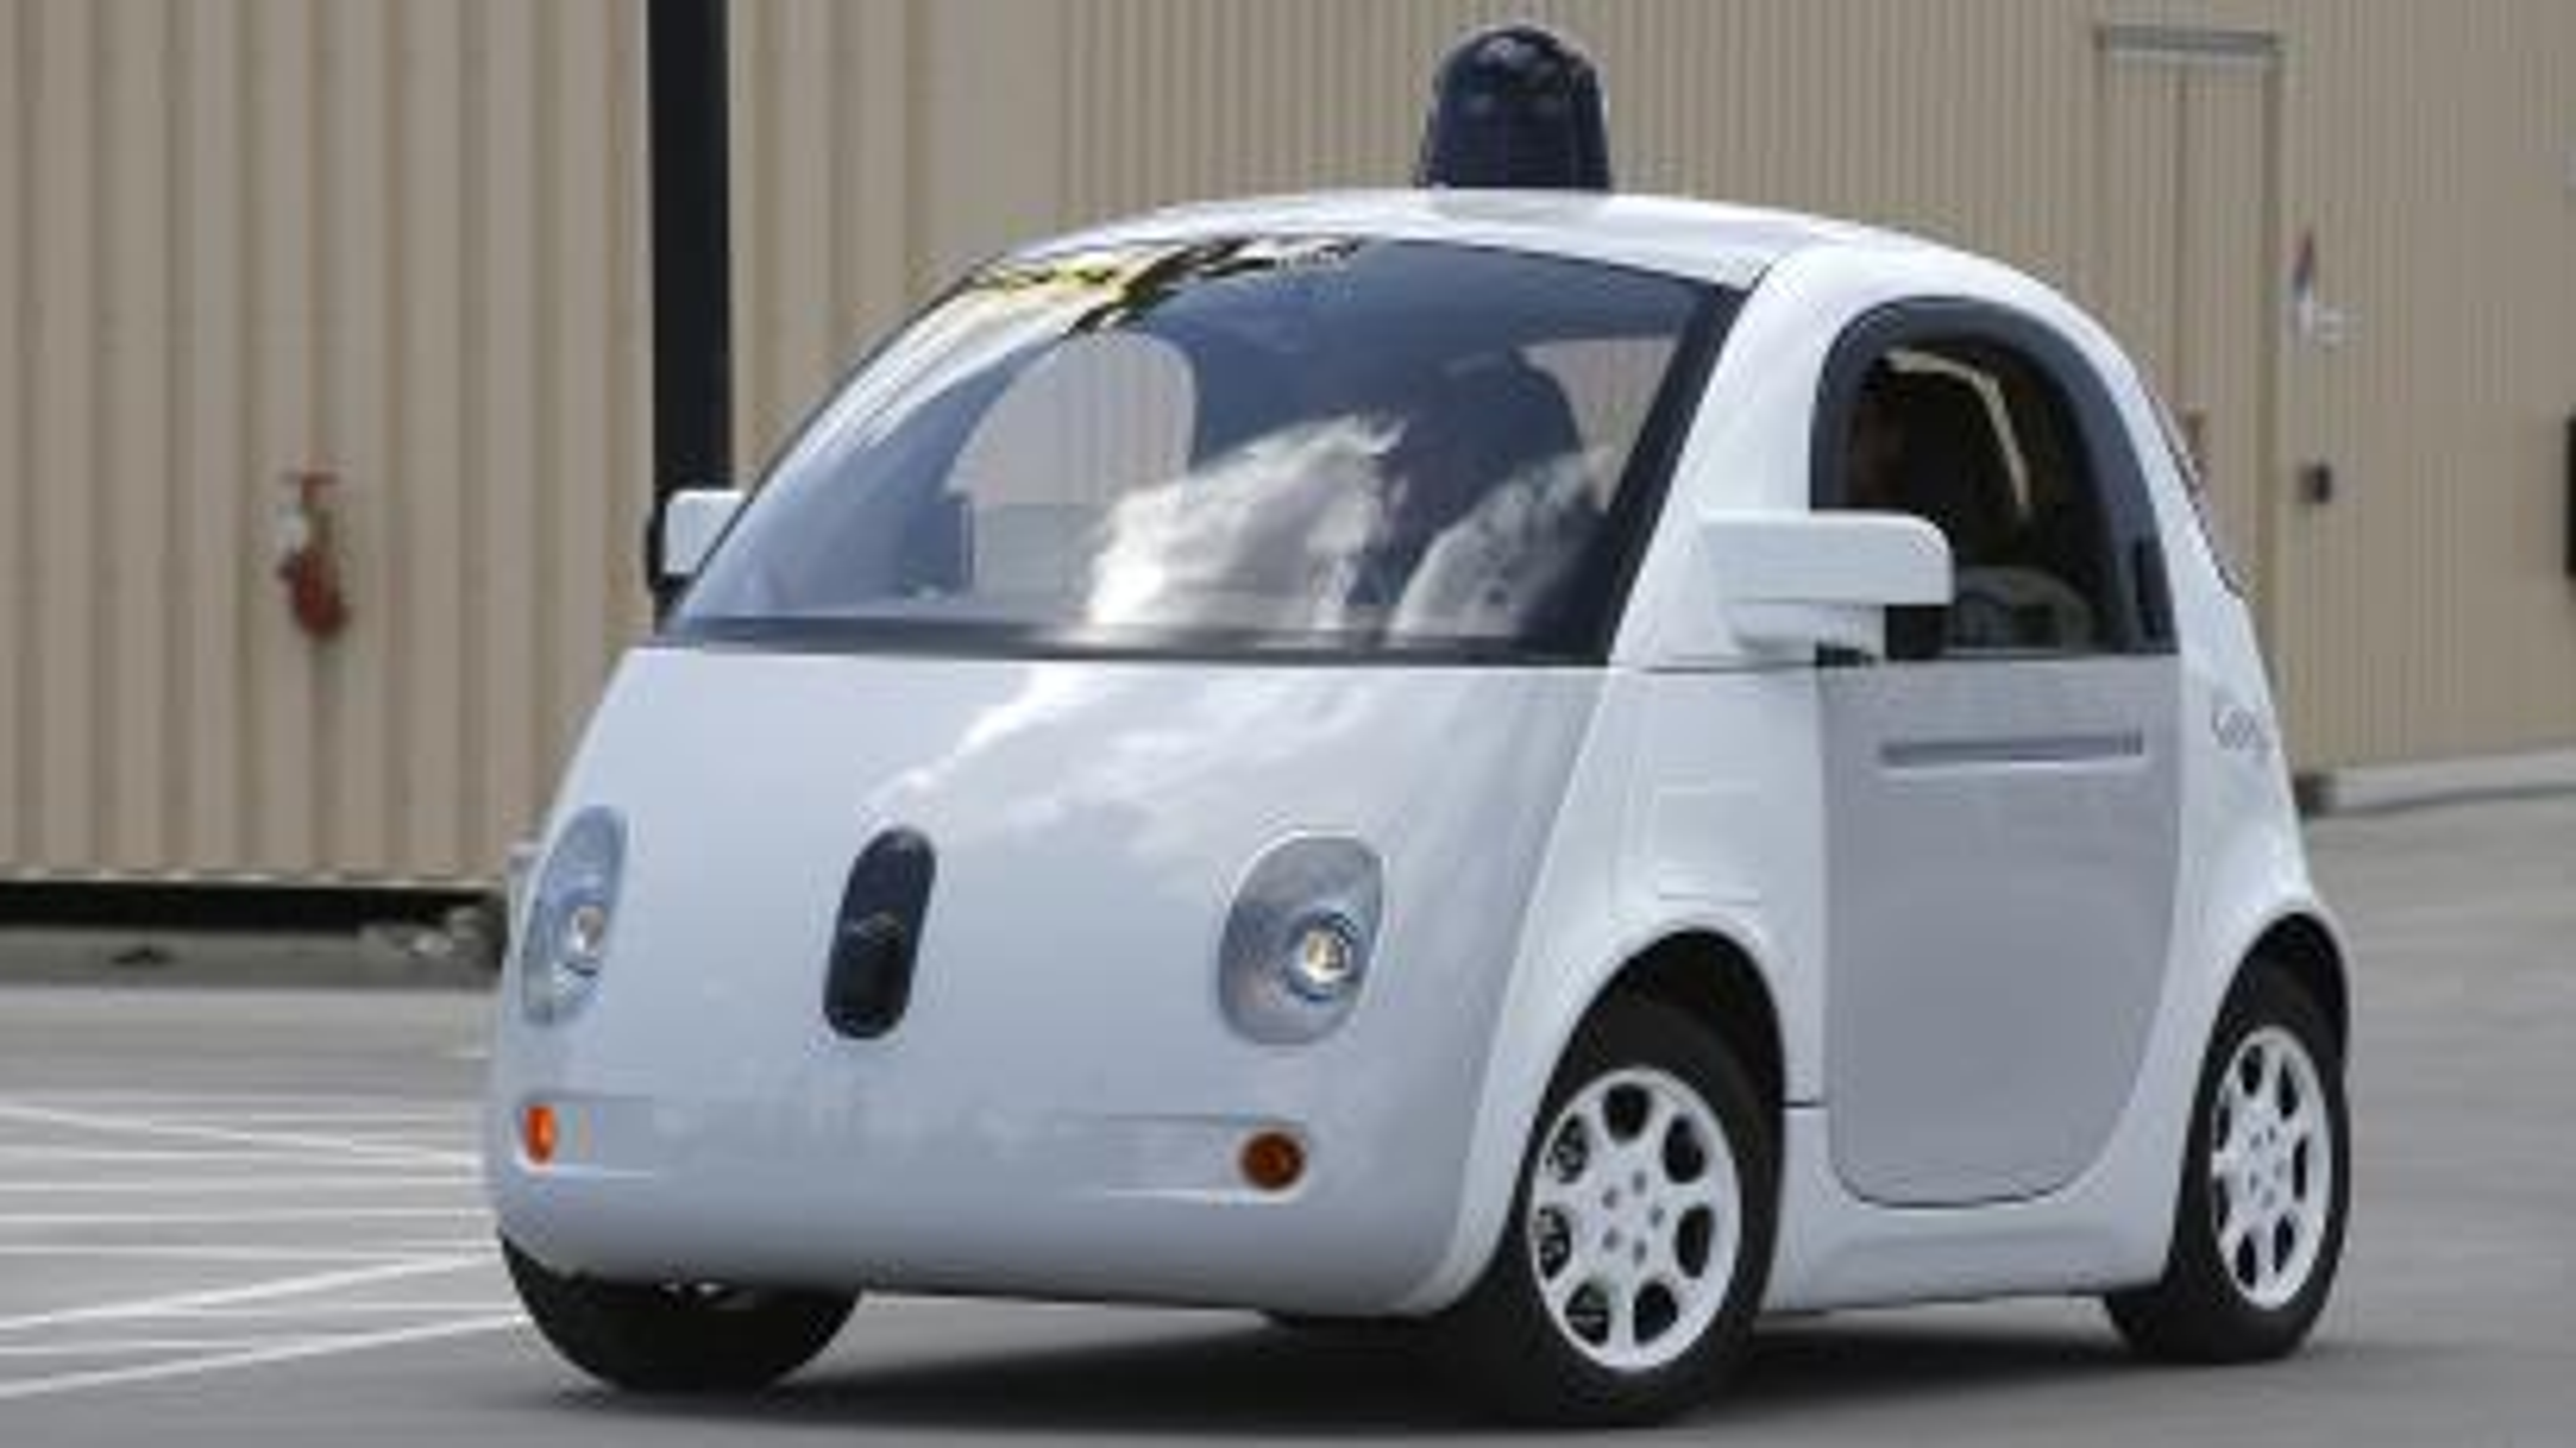 Just how good are Google's driverless cars? — Quartz